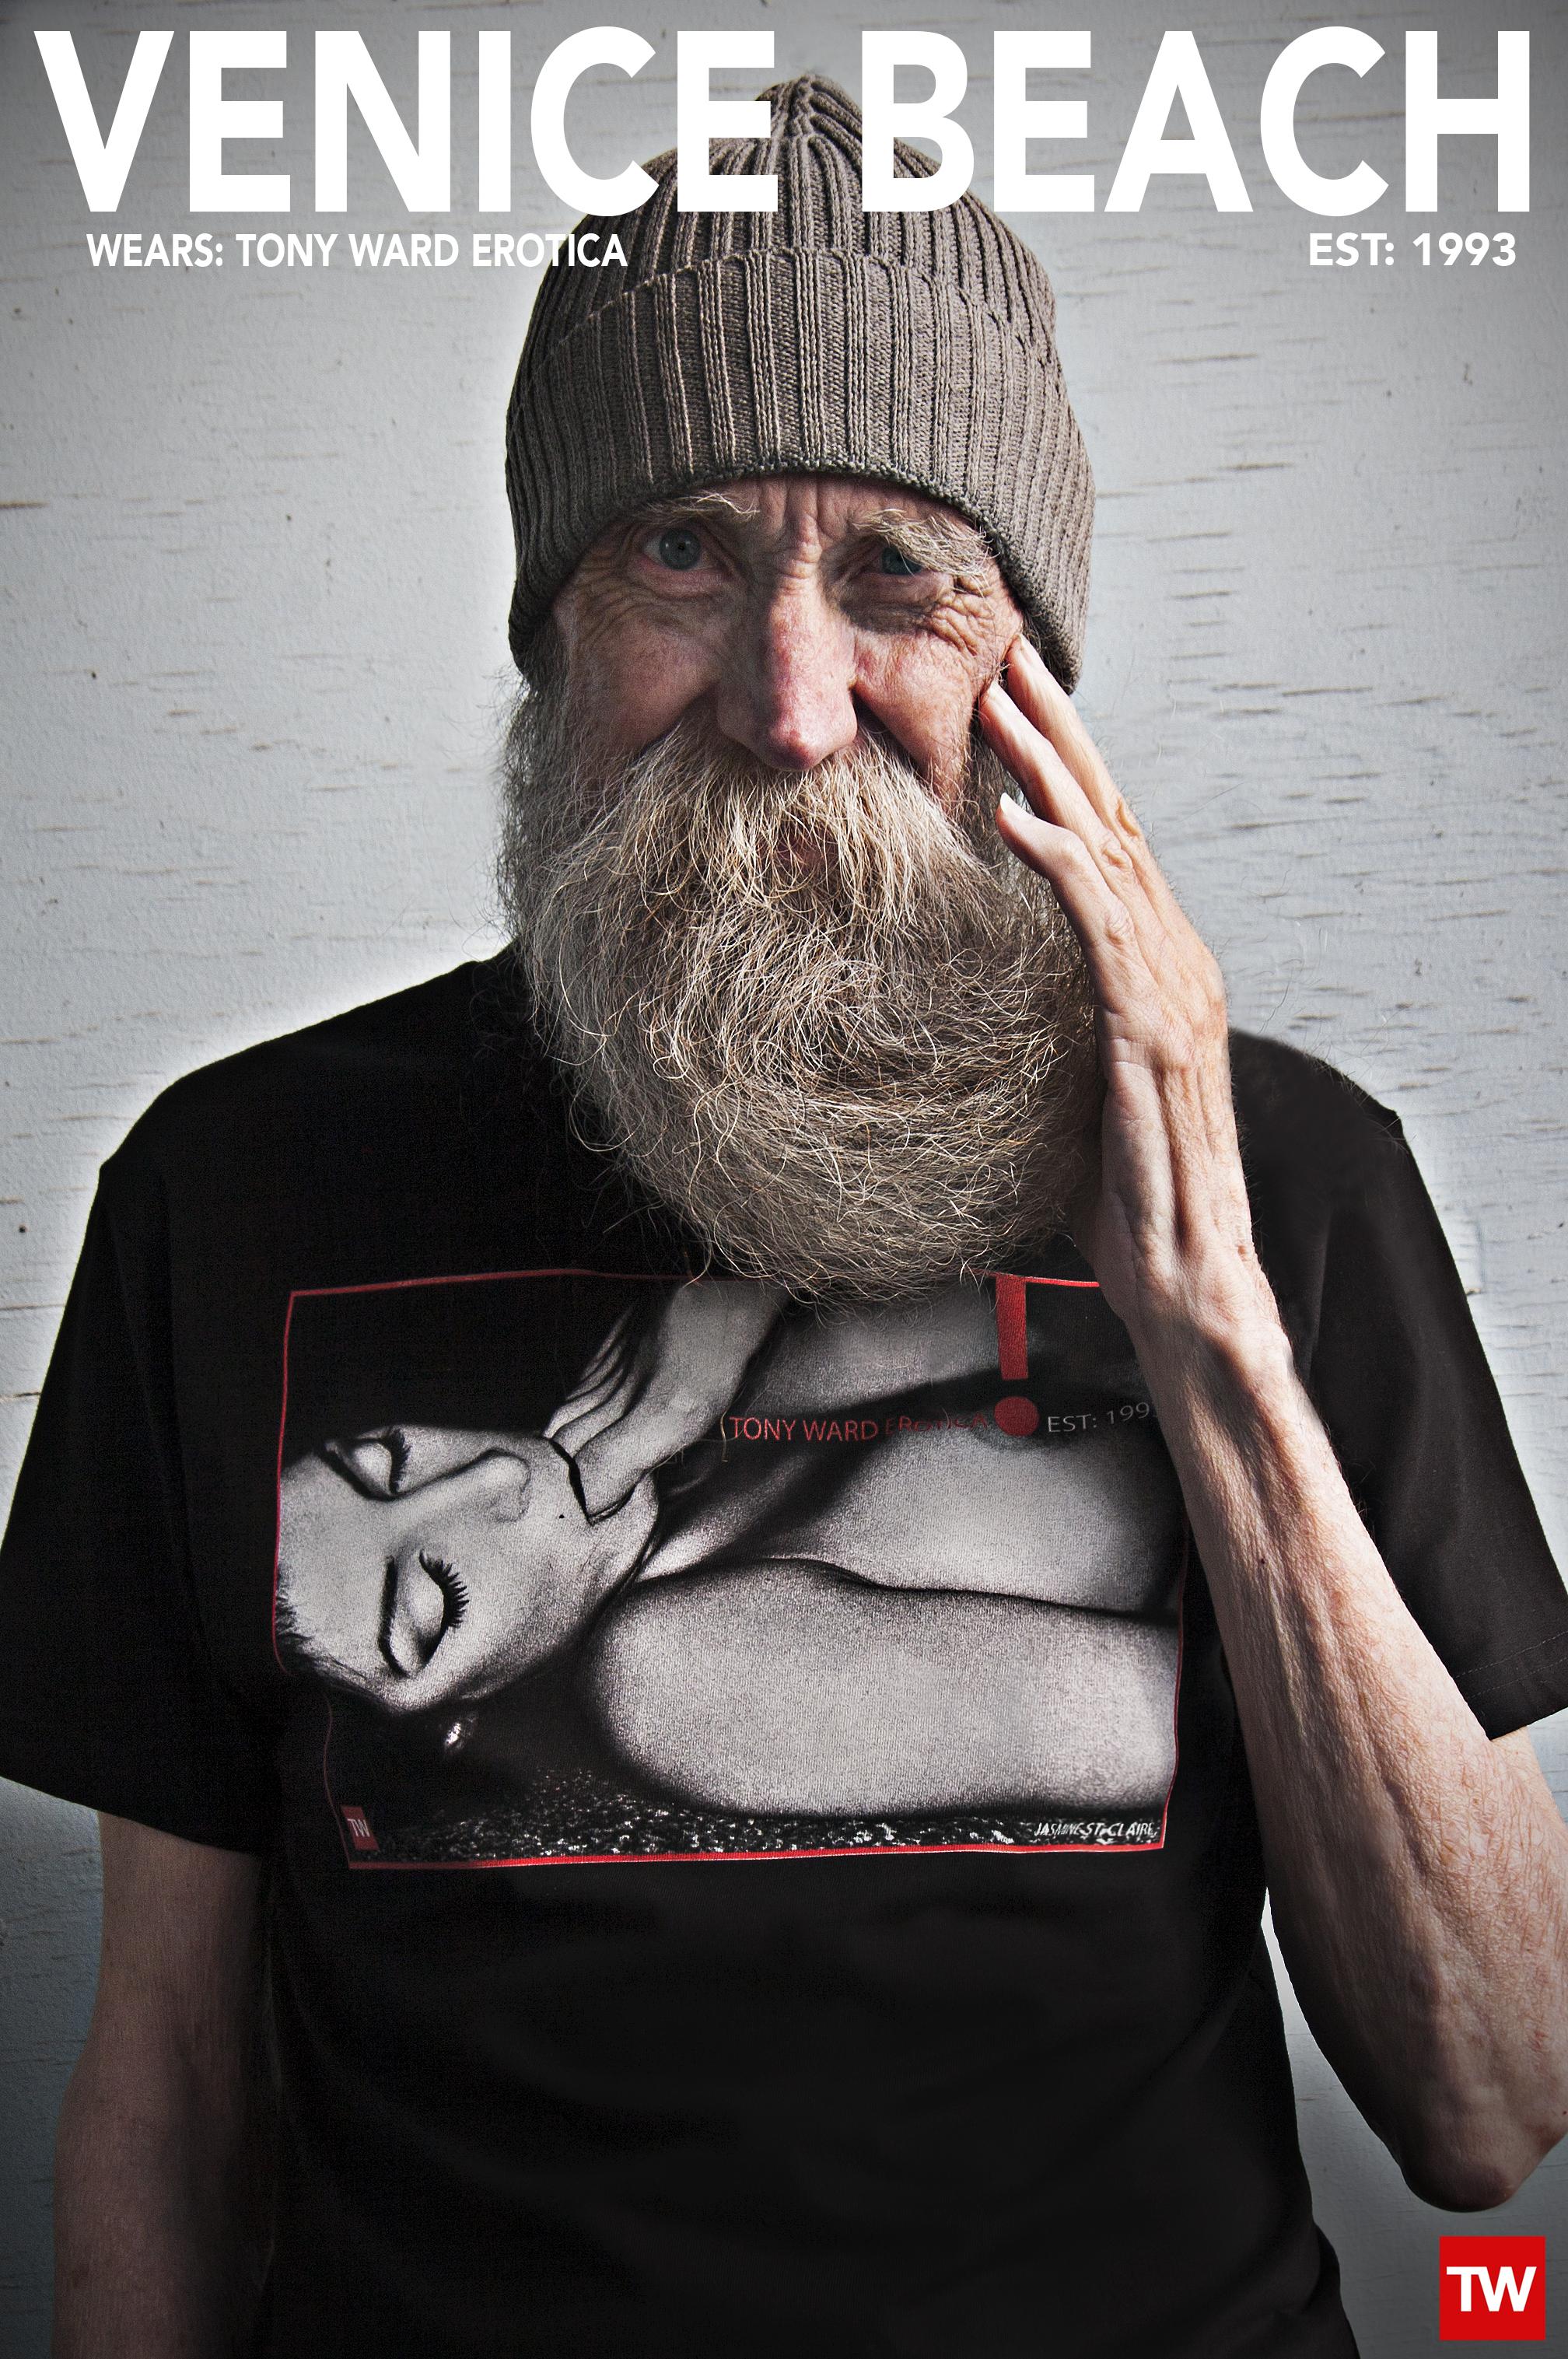 Tony_Ward_erotica_t-shirts_venice_beach_california_bearded_men_portraiture_portrait